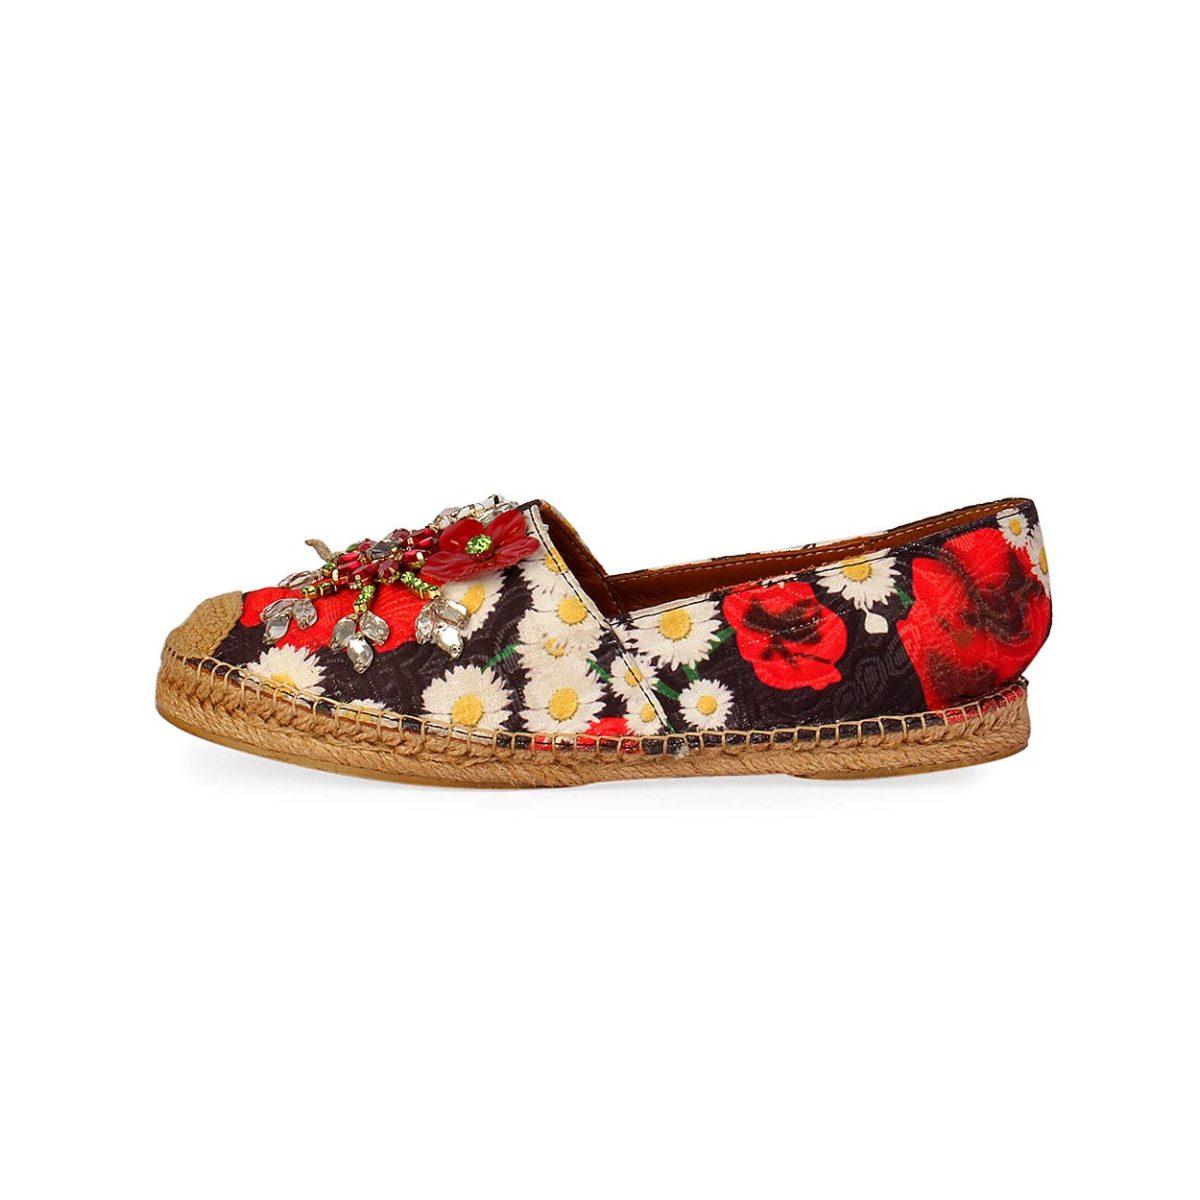 27e7005d0 DOLCE & GABBANA Floral Embellished Espadrilles - S: 37 (4)   Luxity